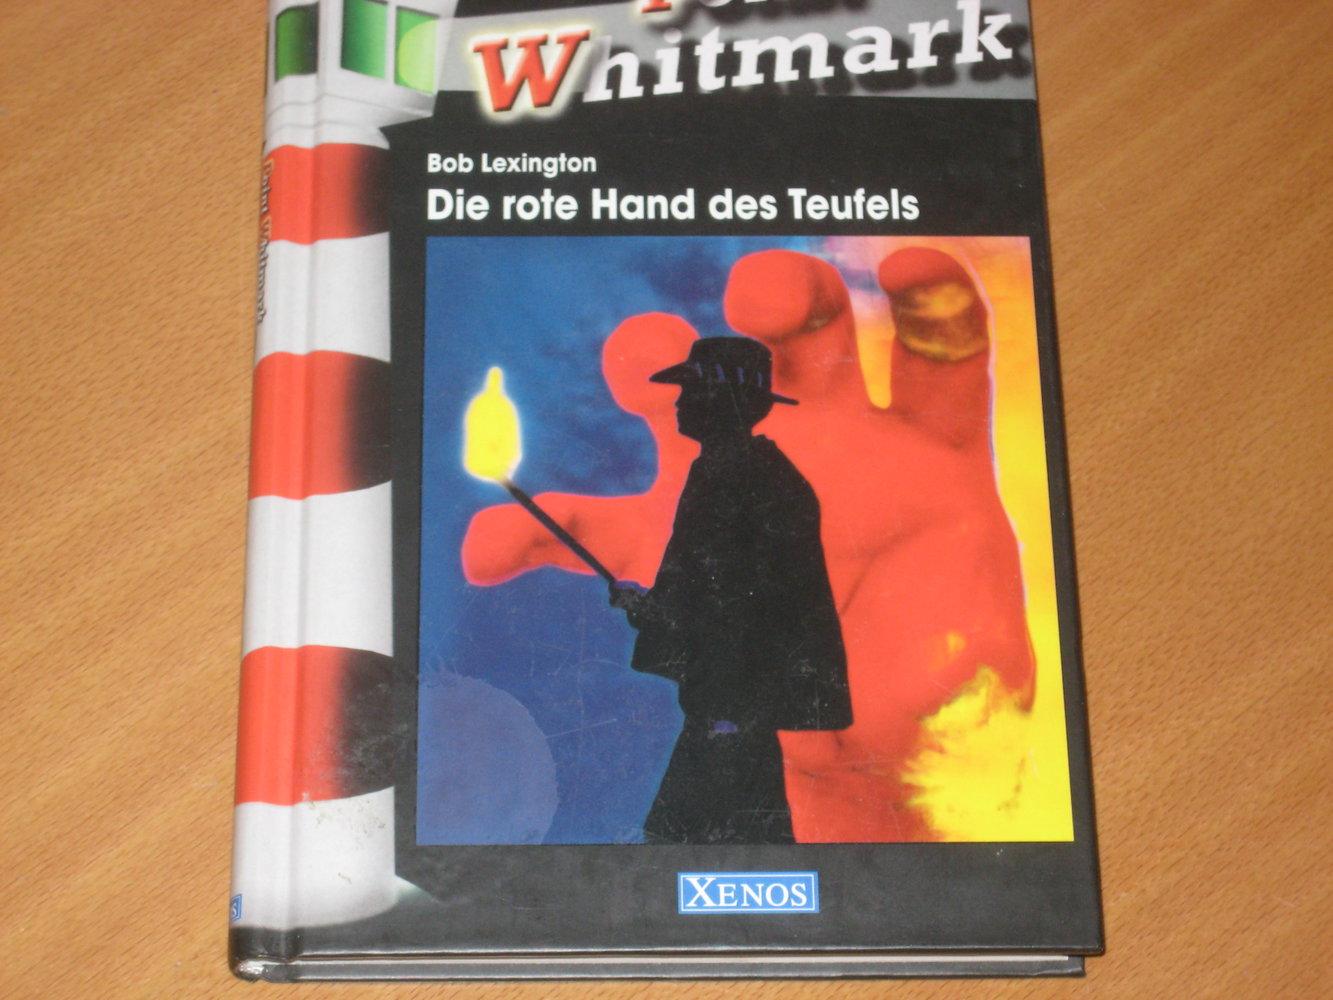 Bob Lexington - Point Whitmark 2 - Die rote Hand des Teufels